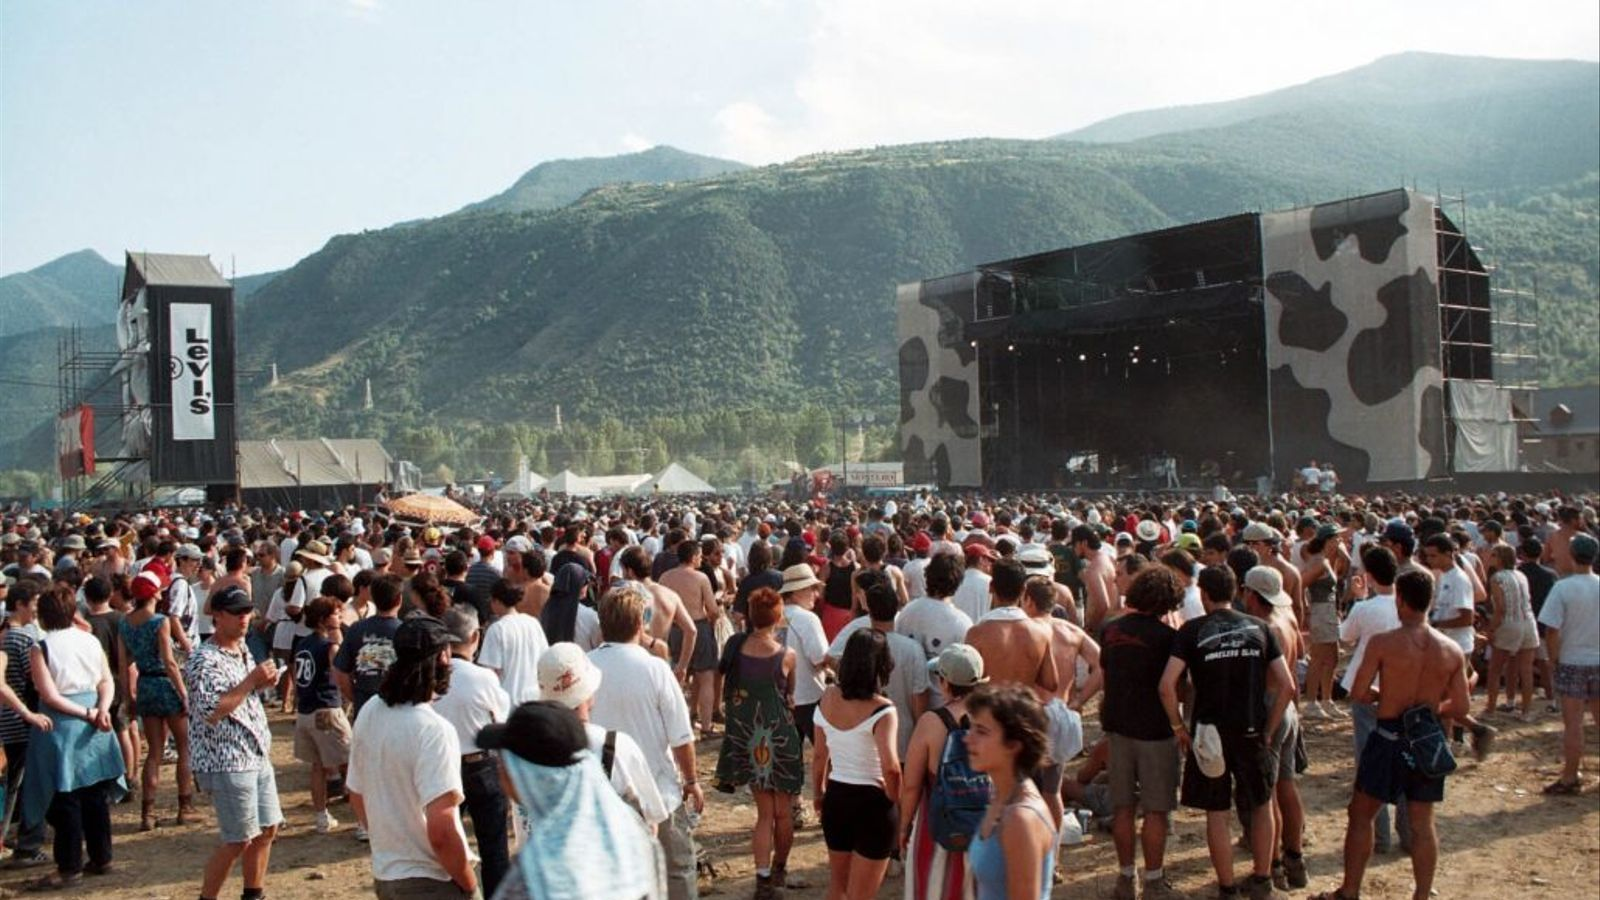 Una imatge del Doctor Music Festival original a Escalarre